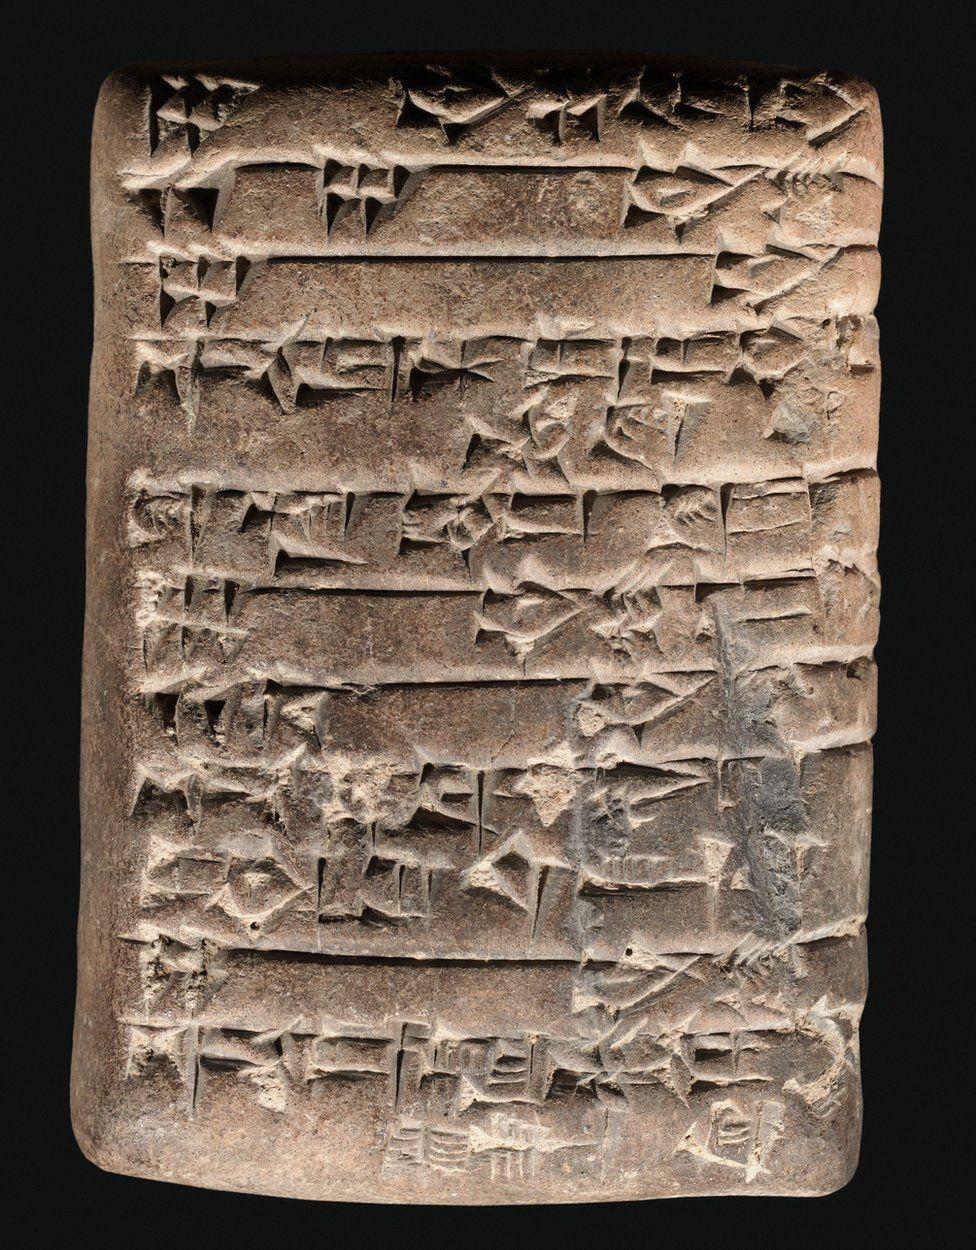 This tablet has an account in Sumerian cuneiform describing the receipt of oxen